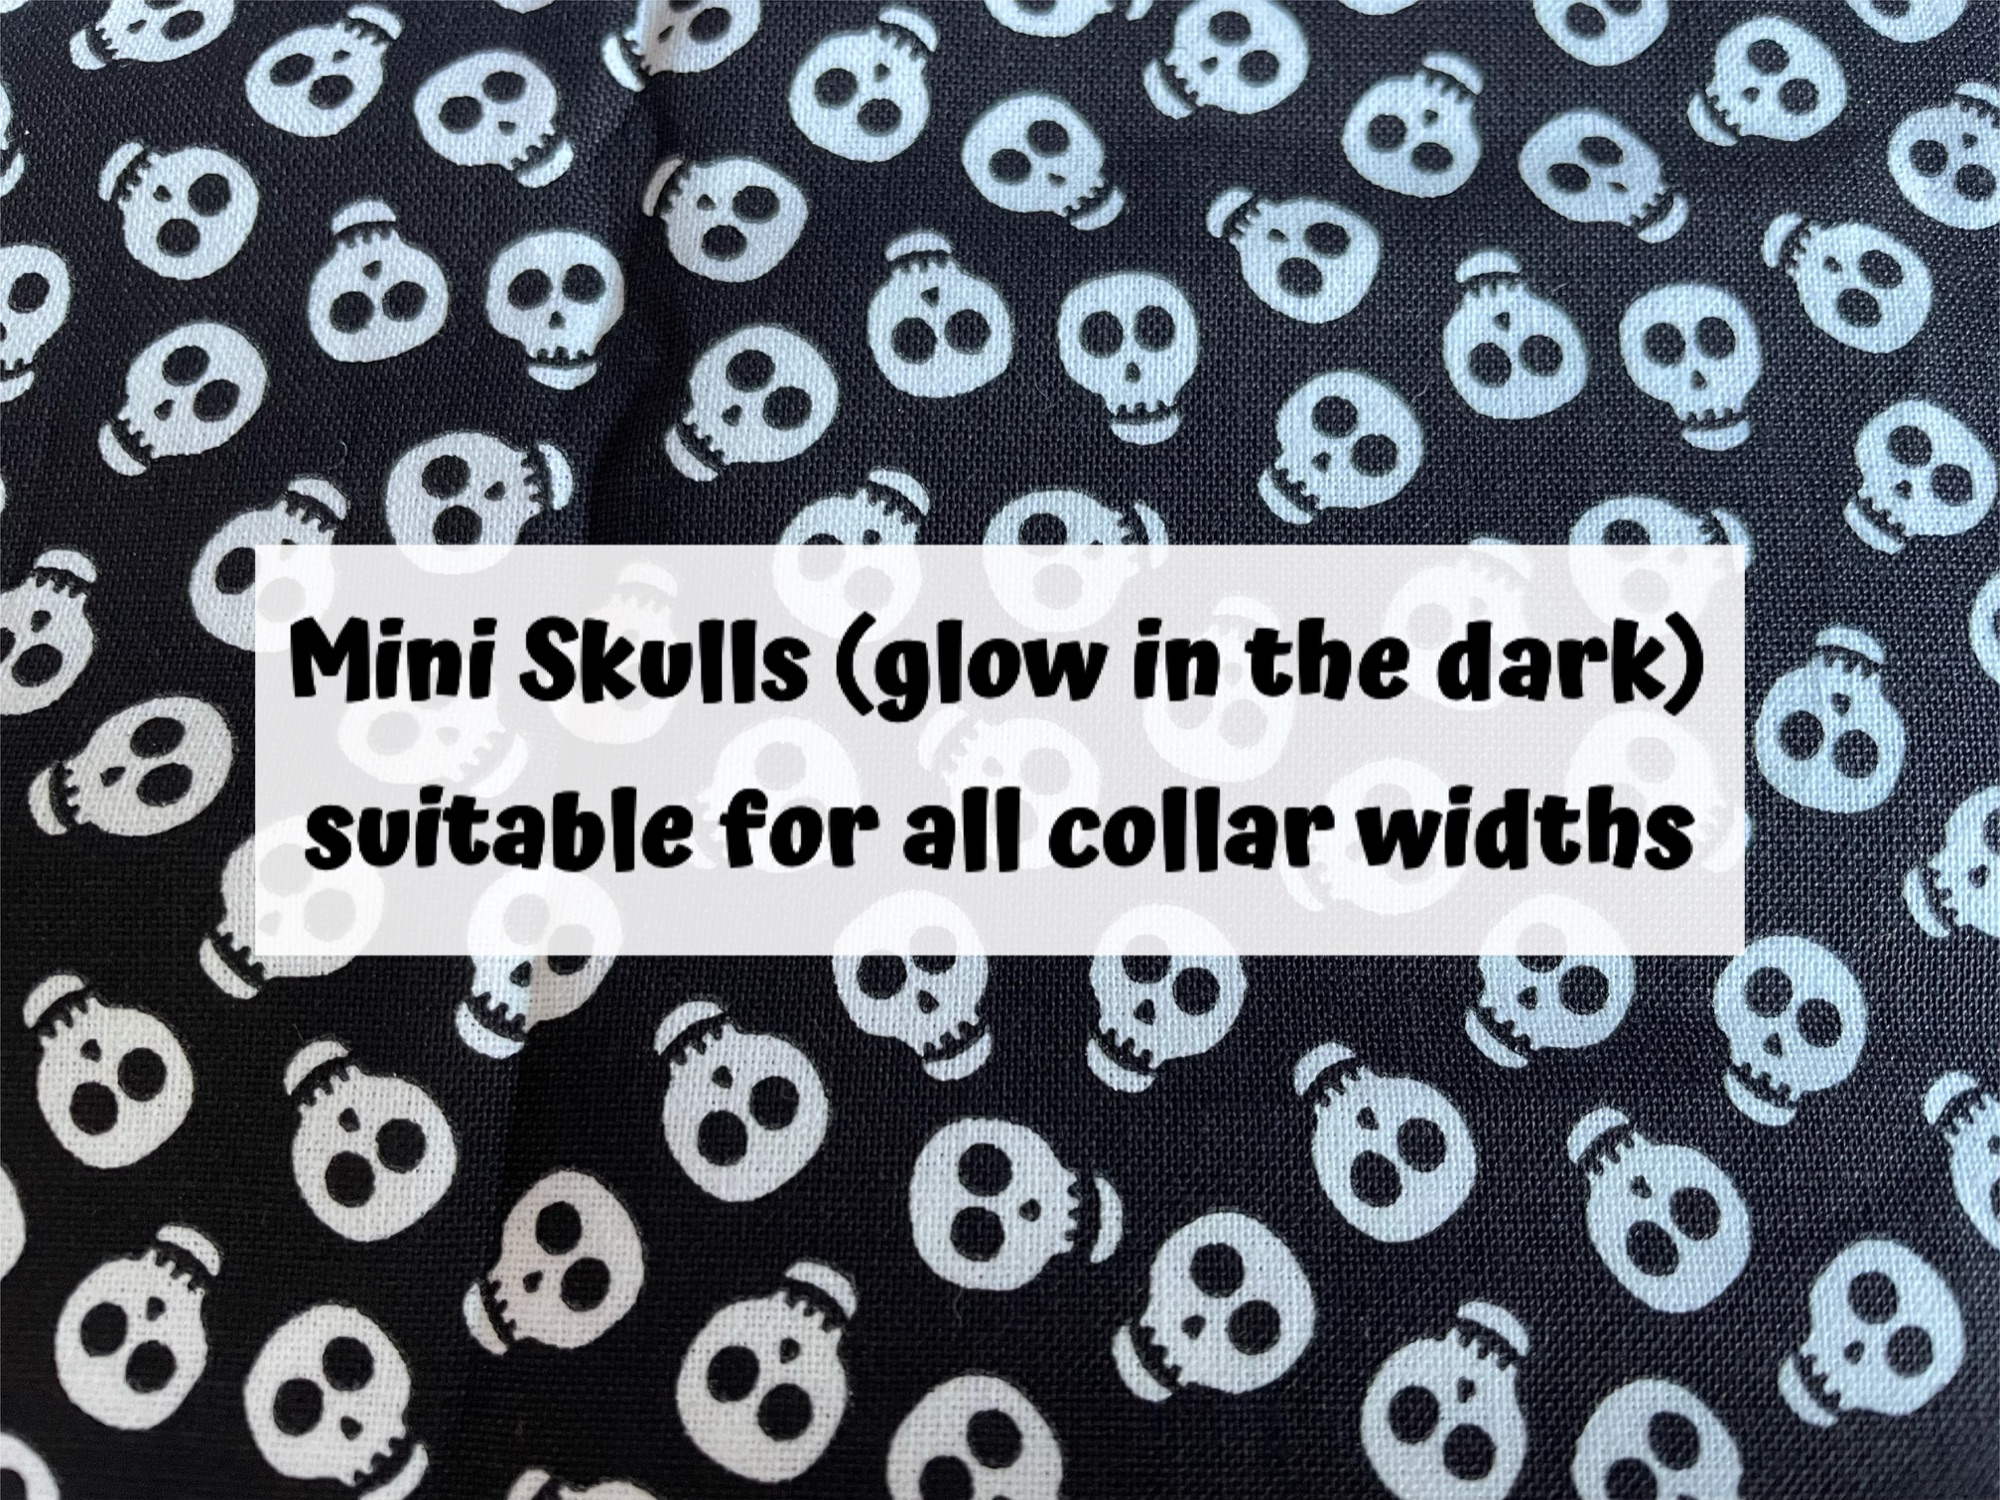 Mini Skulls (glow in the dark)